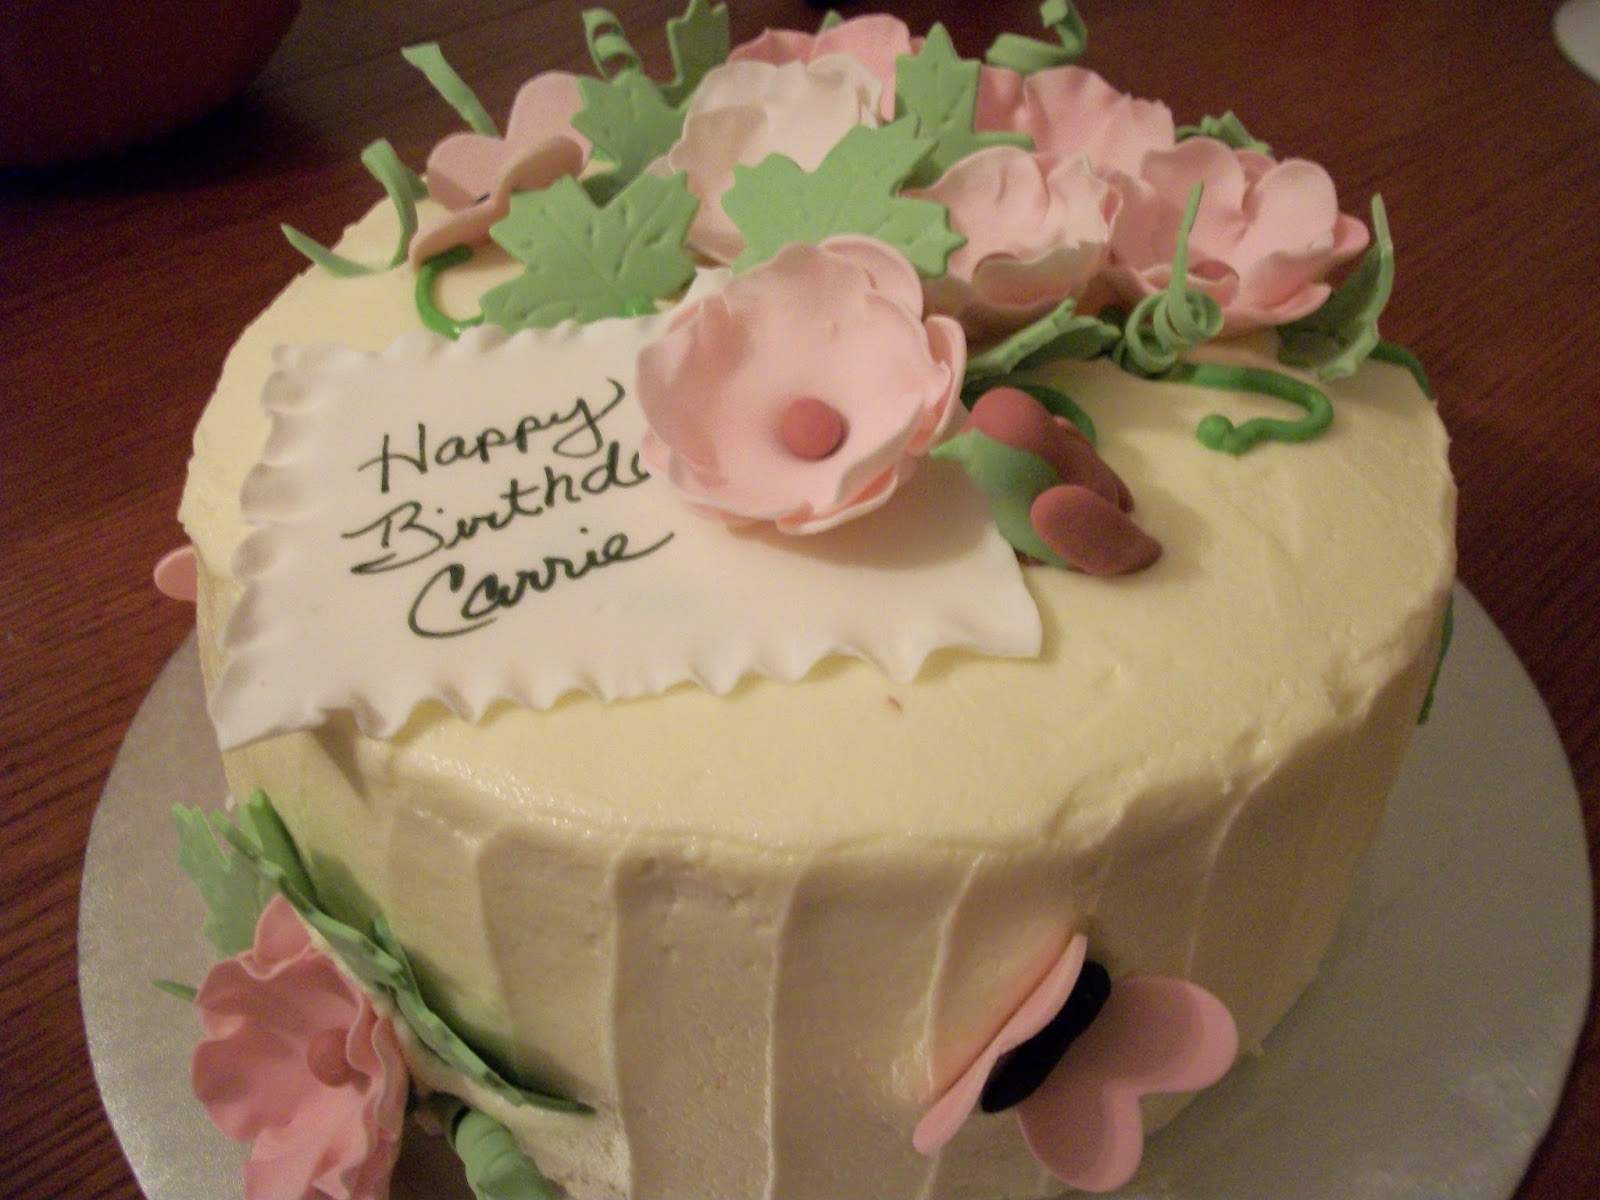 Overcoming with god happy birthday angel carrie happy birthday angel carrie publicscrutiny Gallery